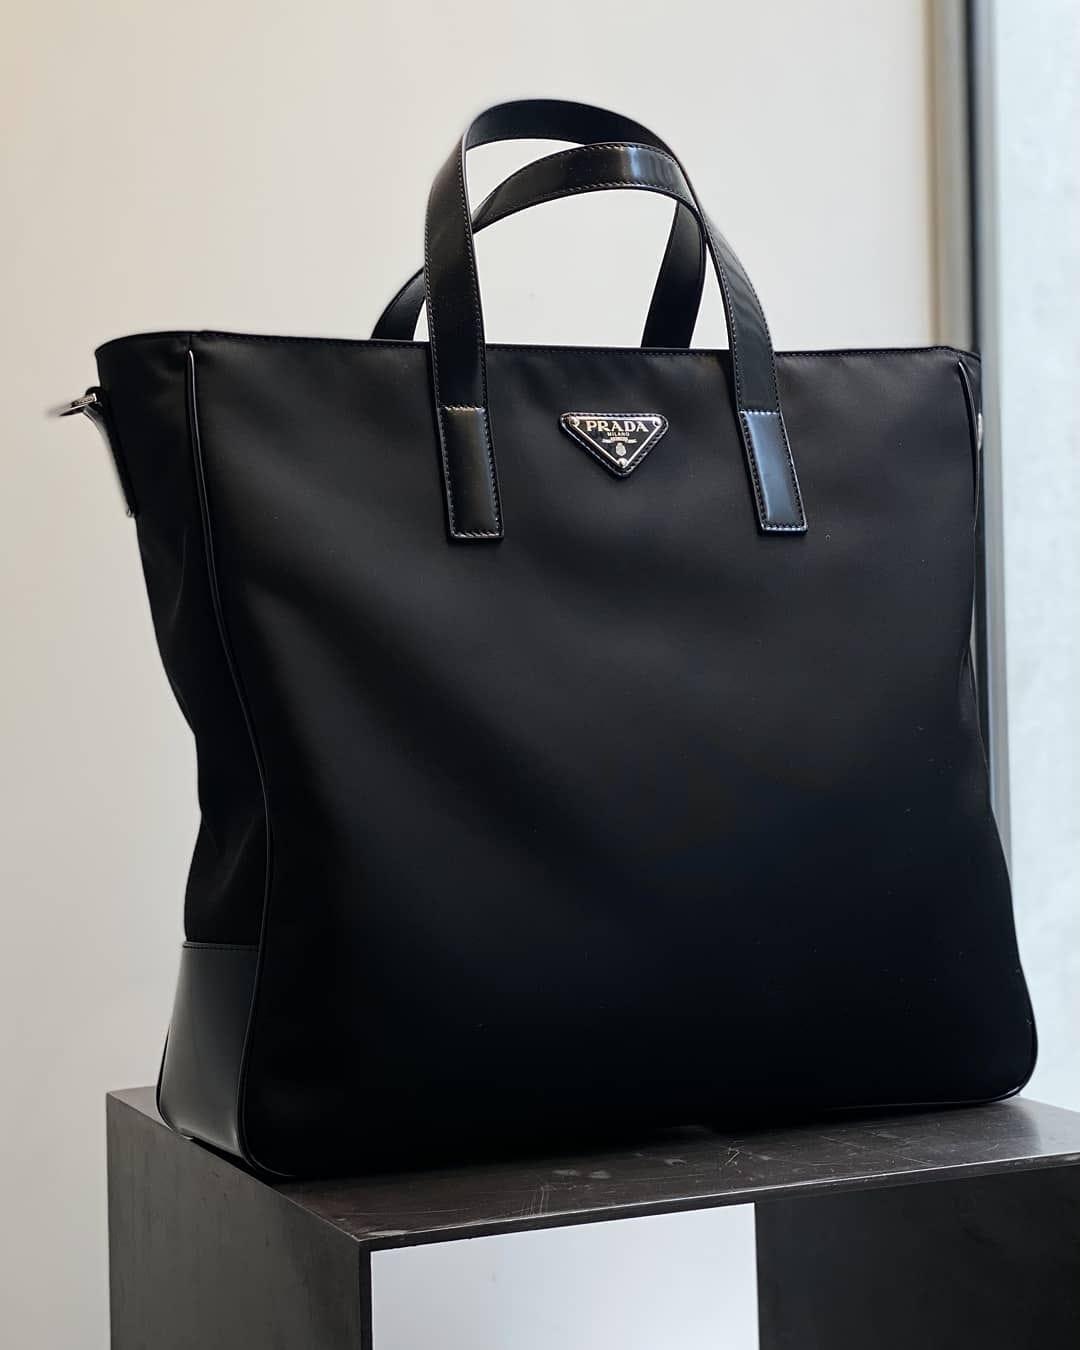 Everyday tote  @genteroma @prada   Prada Re-Nylon tote bag available on genteroma.com and in store at Via del Babuino, 185.  #GenteRoma #Prada #FW21